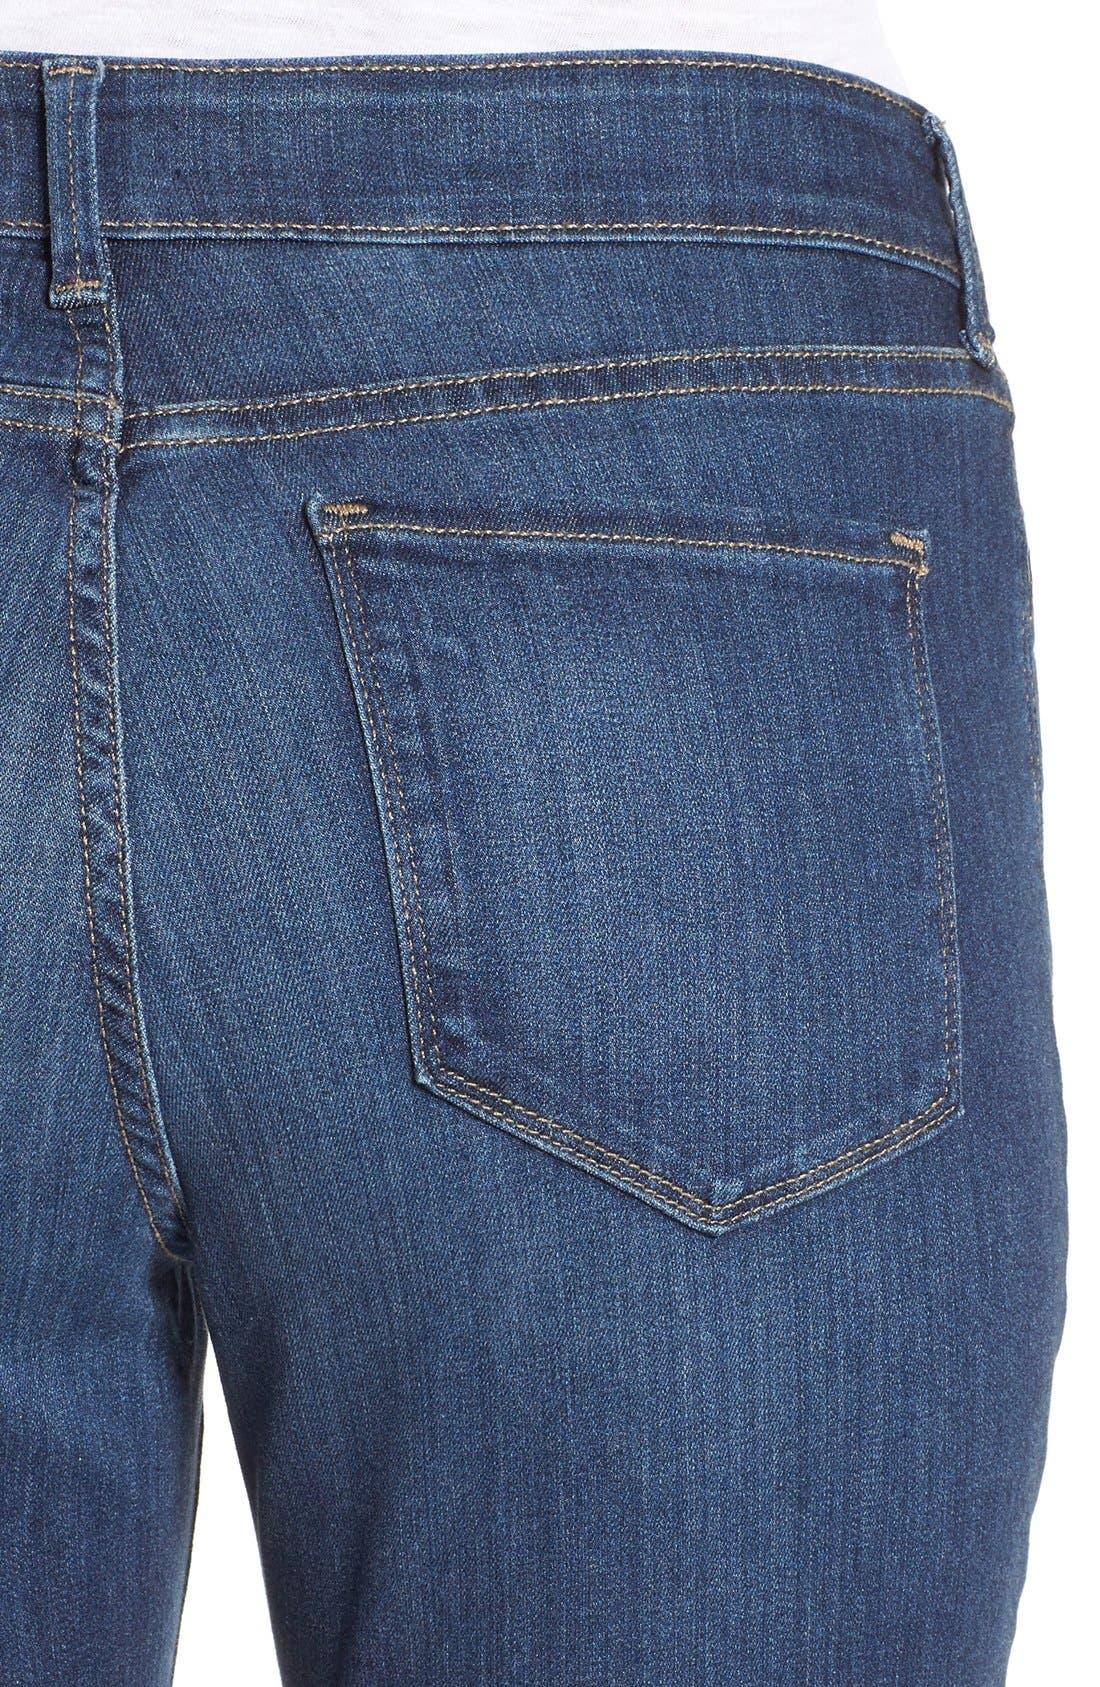 Alternate Image 3  - NYDJ 'Ami' Stretch Skinny Jeans (Regular & Petite)